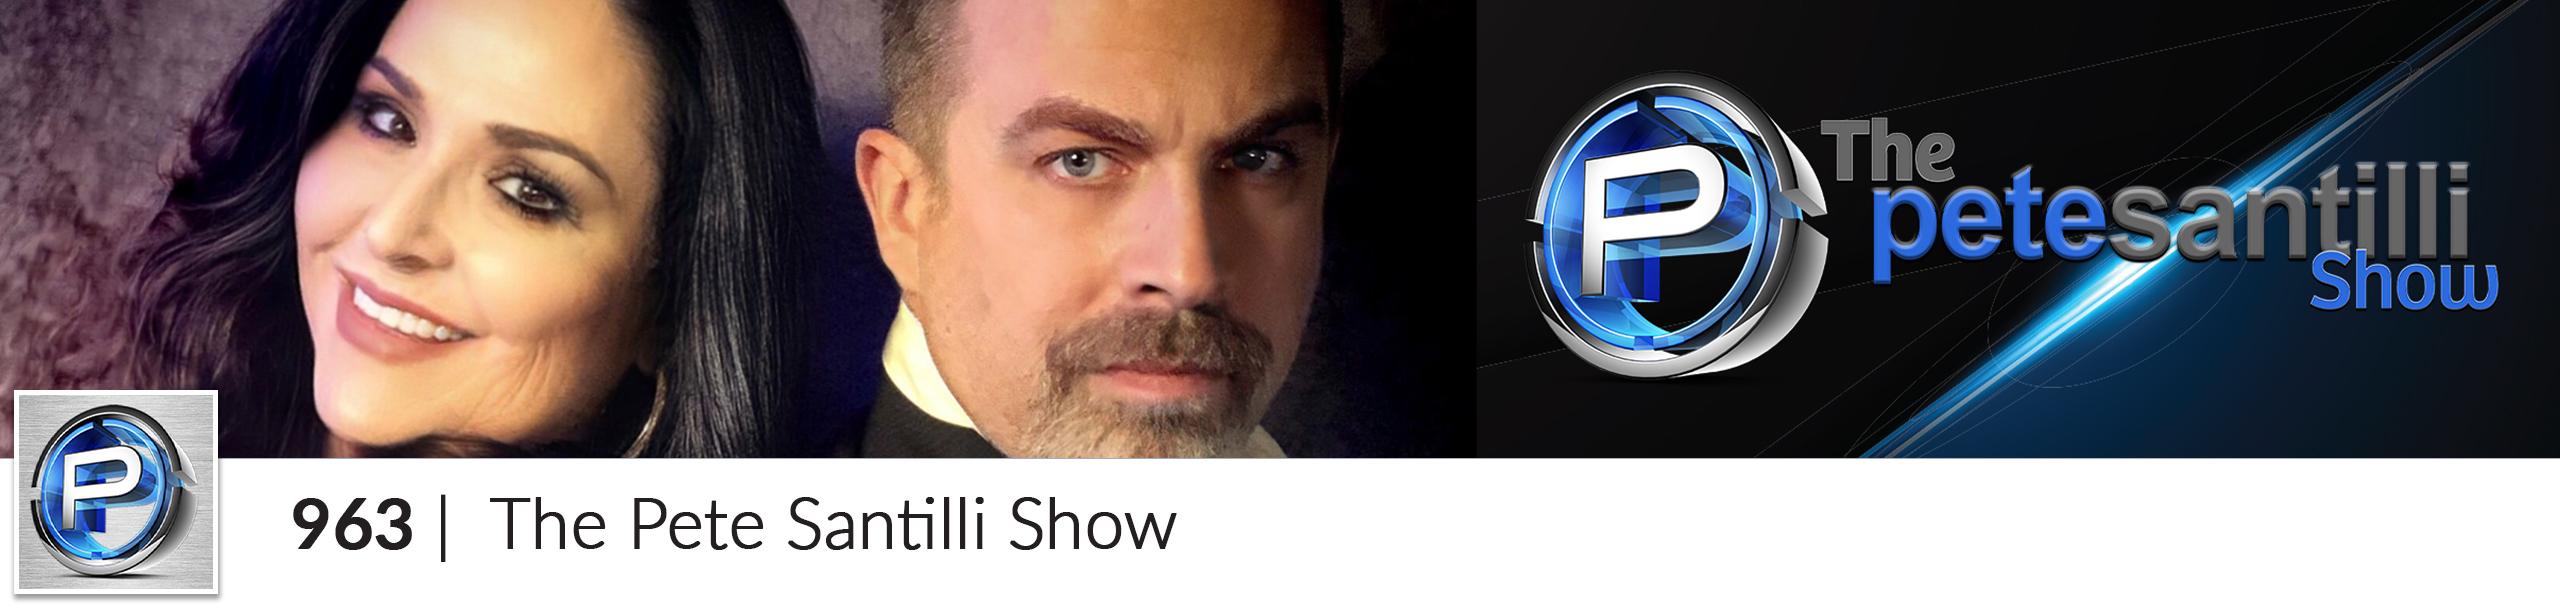 The_Pete_Santilli_Show-header01